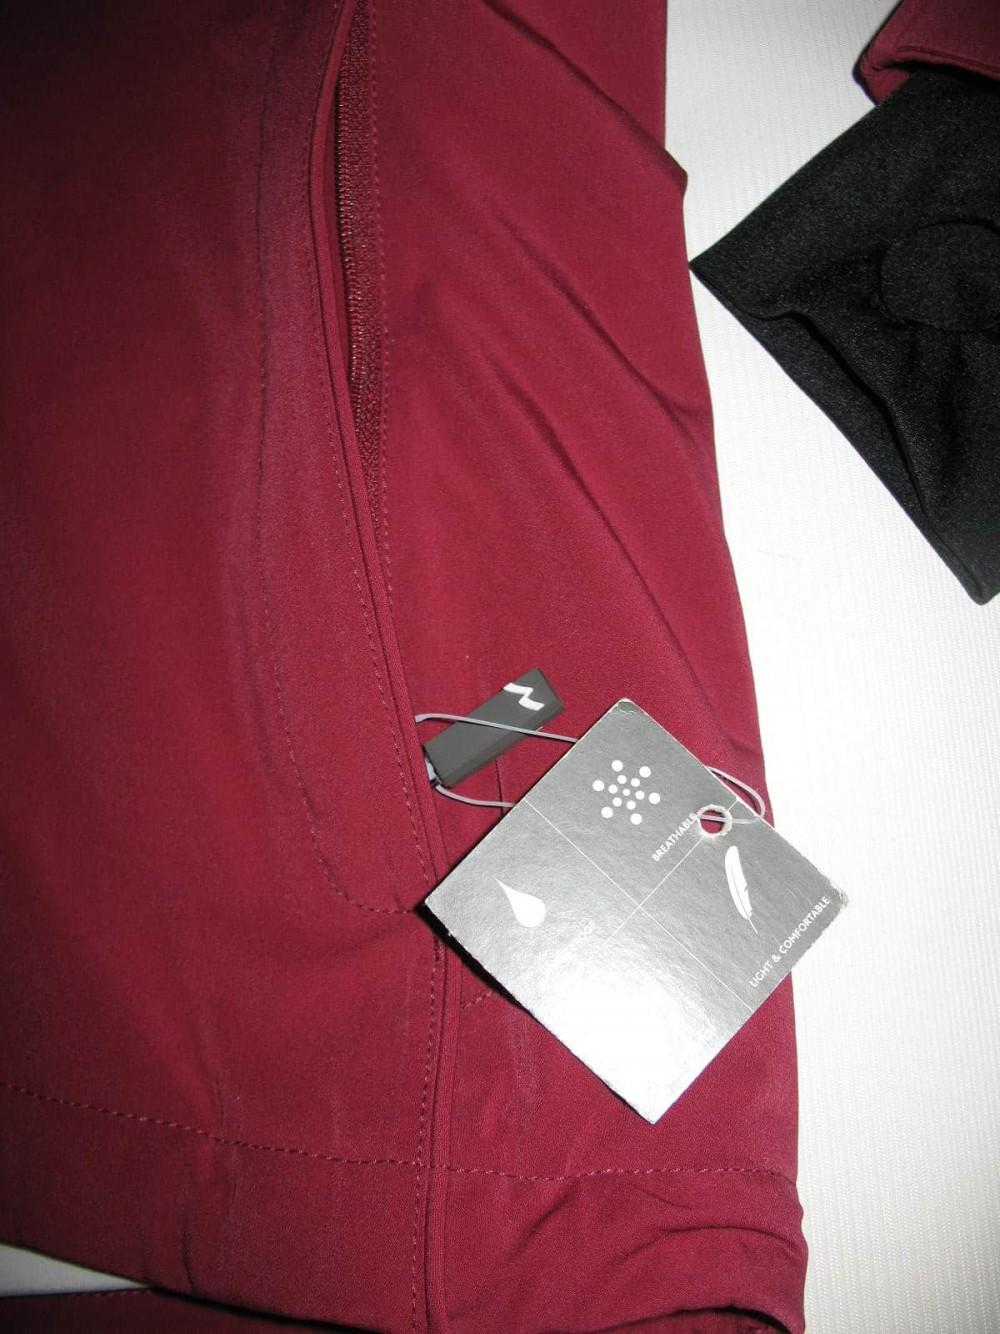 Куртка MOUNTAIN FORCE outdoor jacket lady (размер 36/S) - 5